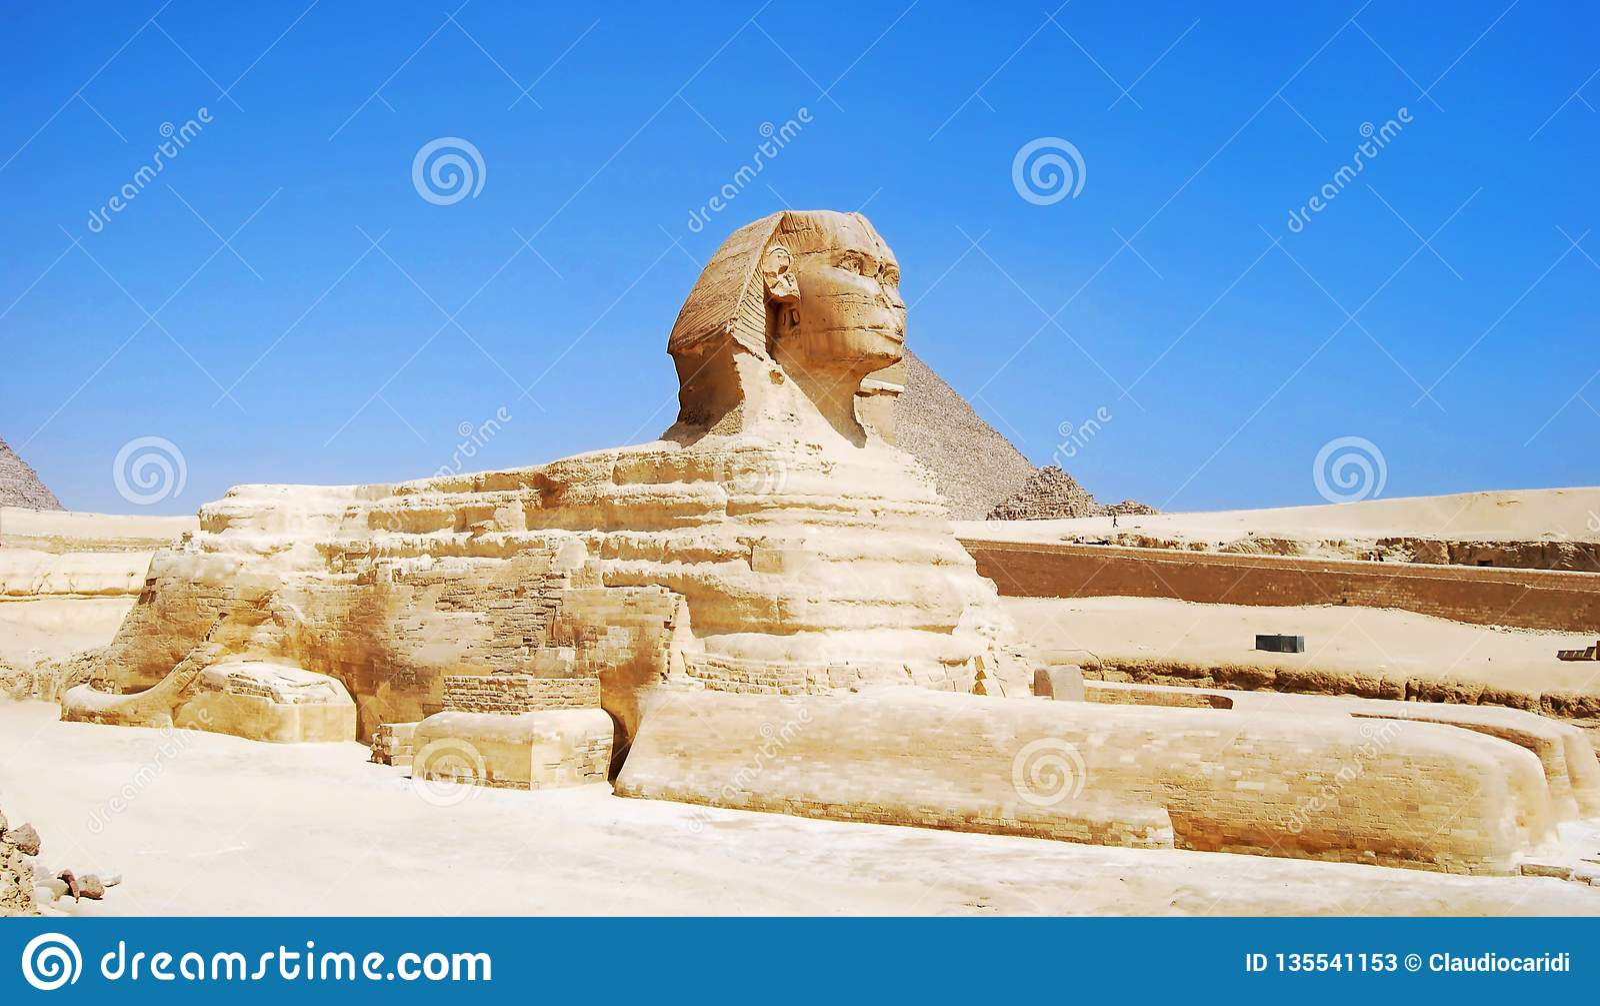 Le grand sphinx à Gizeh, Egypte